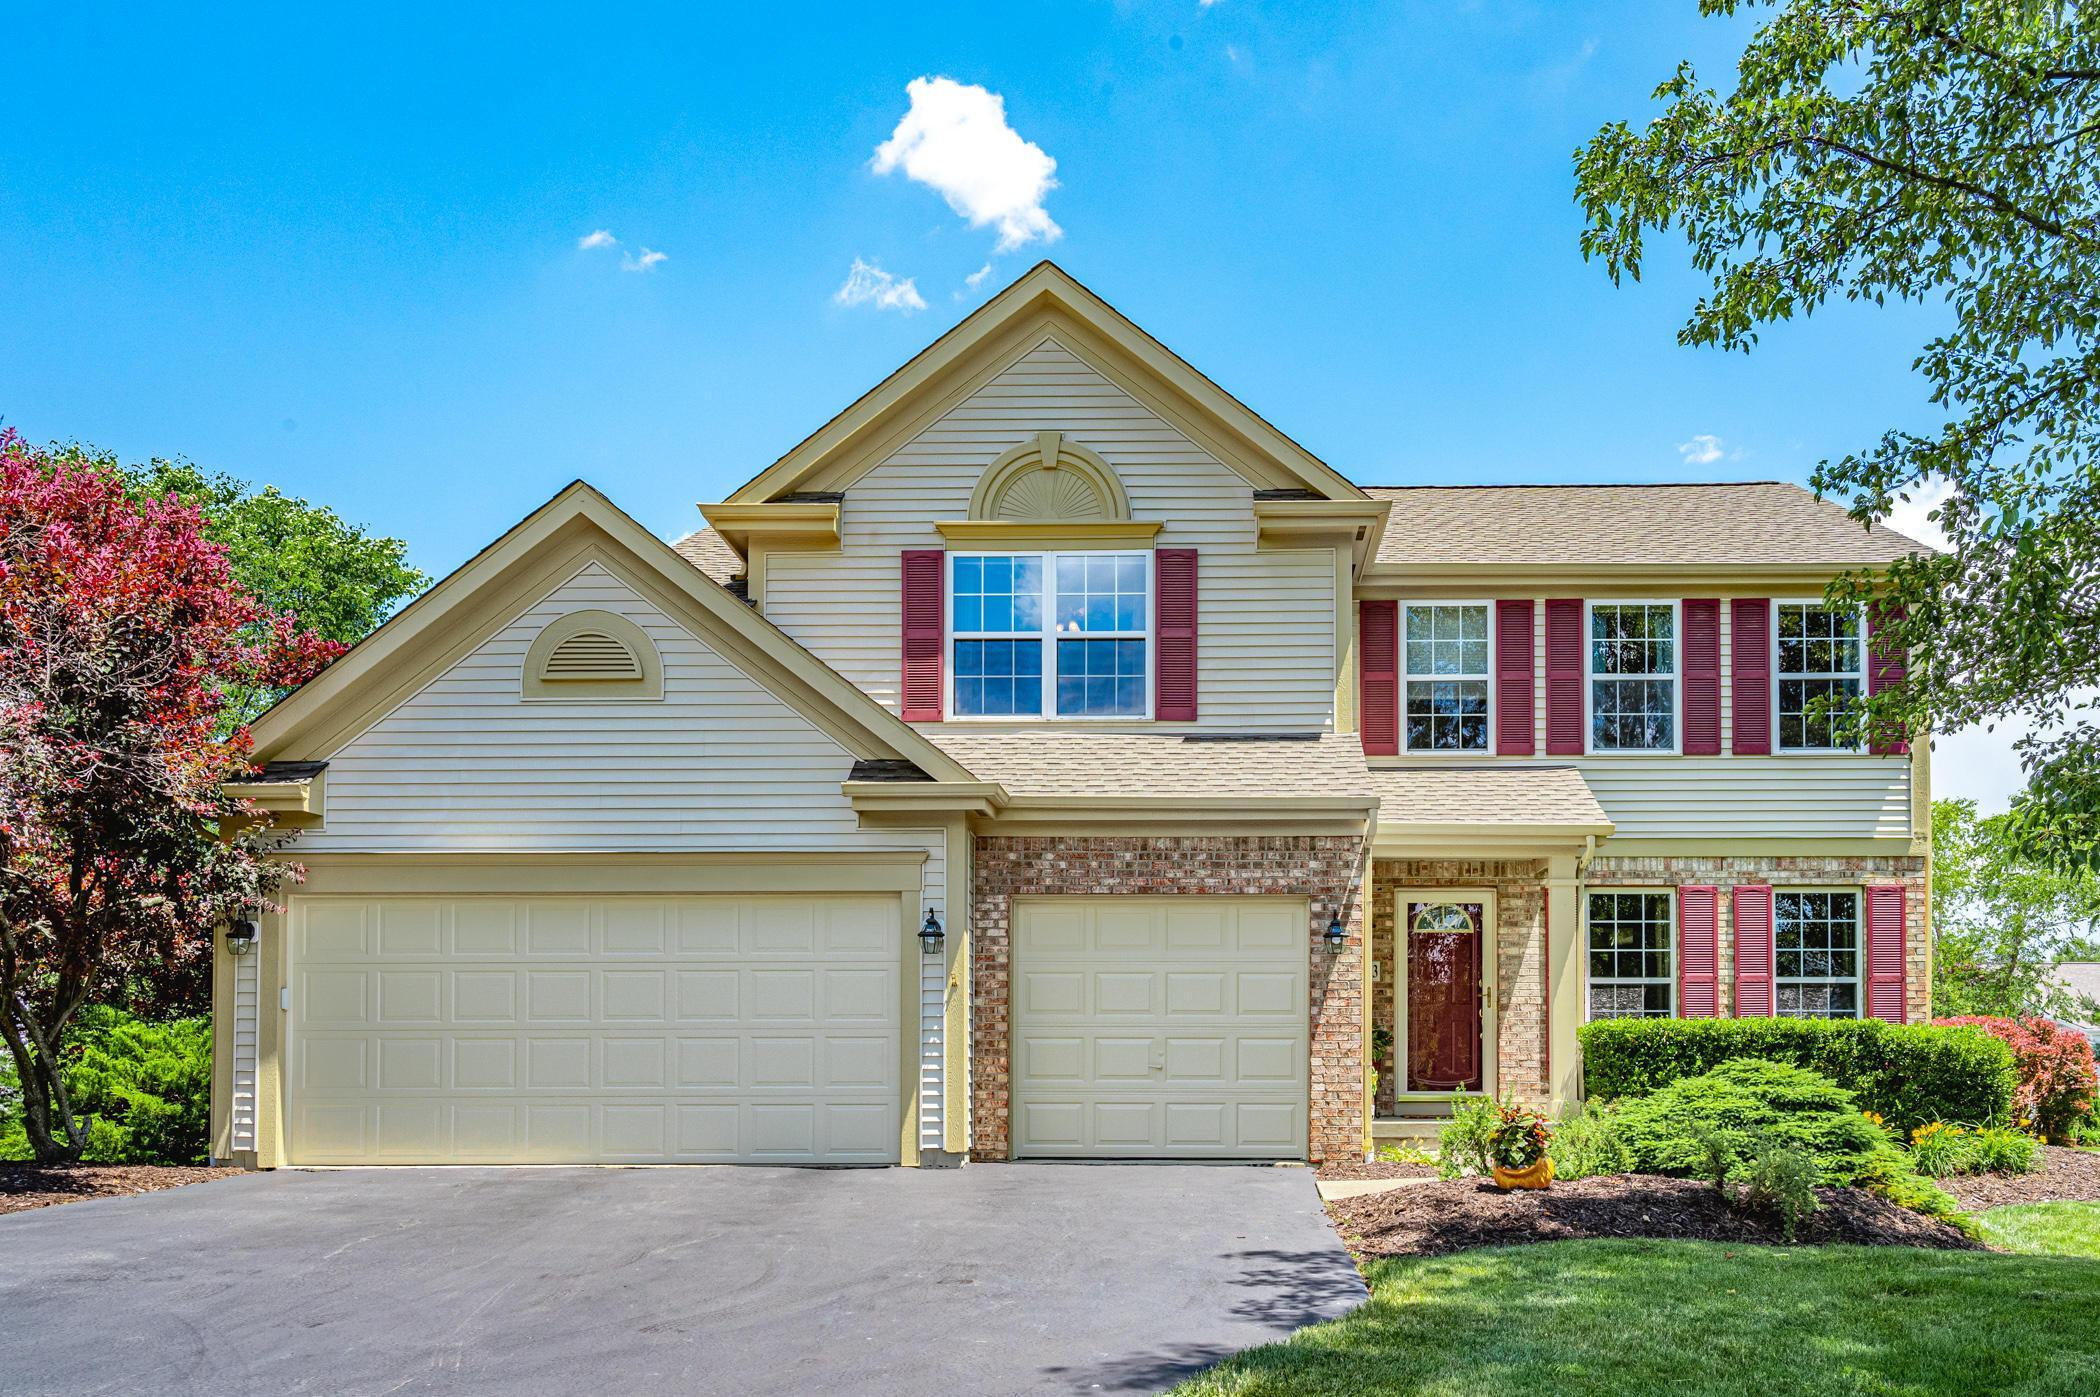 6033 Seton Court, Lewis Center, Ohio 43035, 4 Bedrooms Bedrooms, ,4 BathroomsBathrooms,Residential,For Sale,Seton,220020724